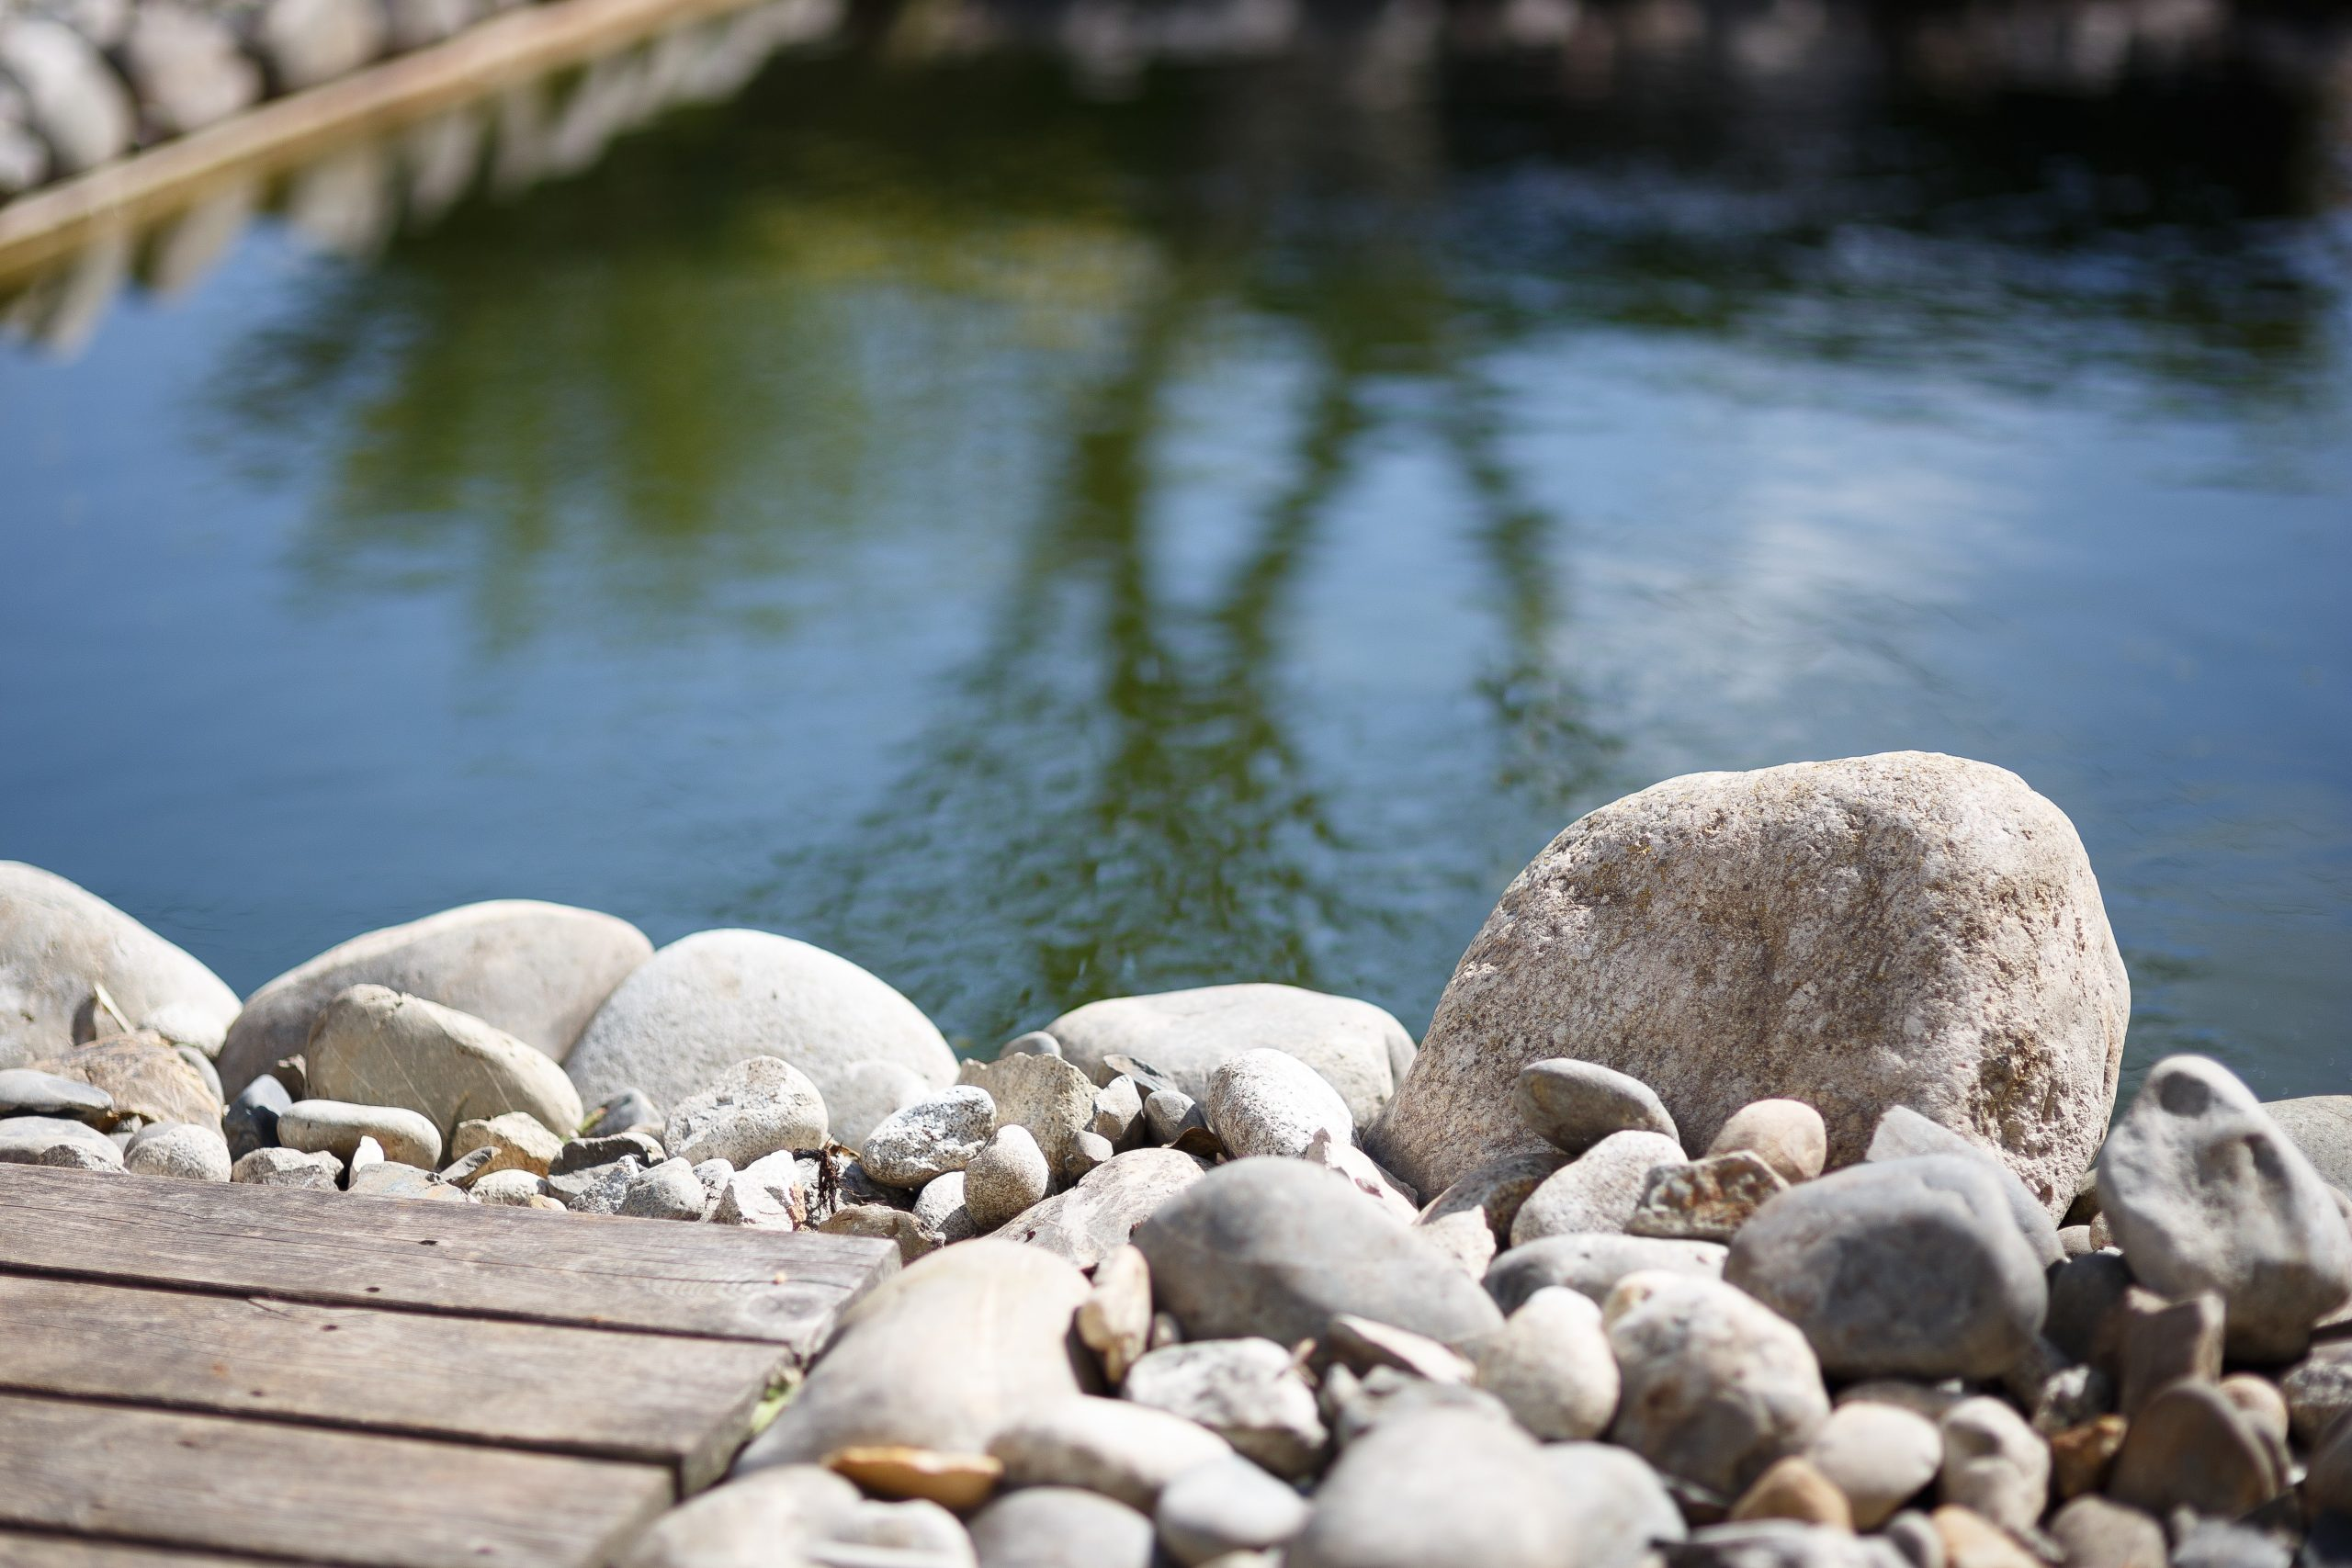 Bassin De Jardin 25M3 - Kit Bassin Imagineo Avec Etanchéité ... pour Kit Bassin Jardin